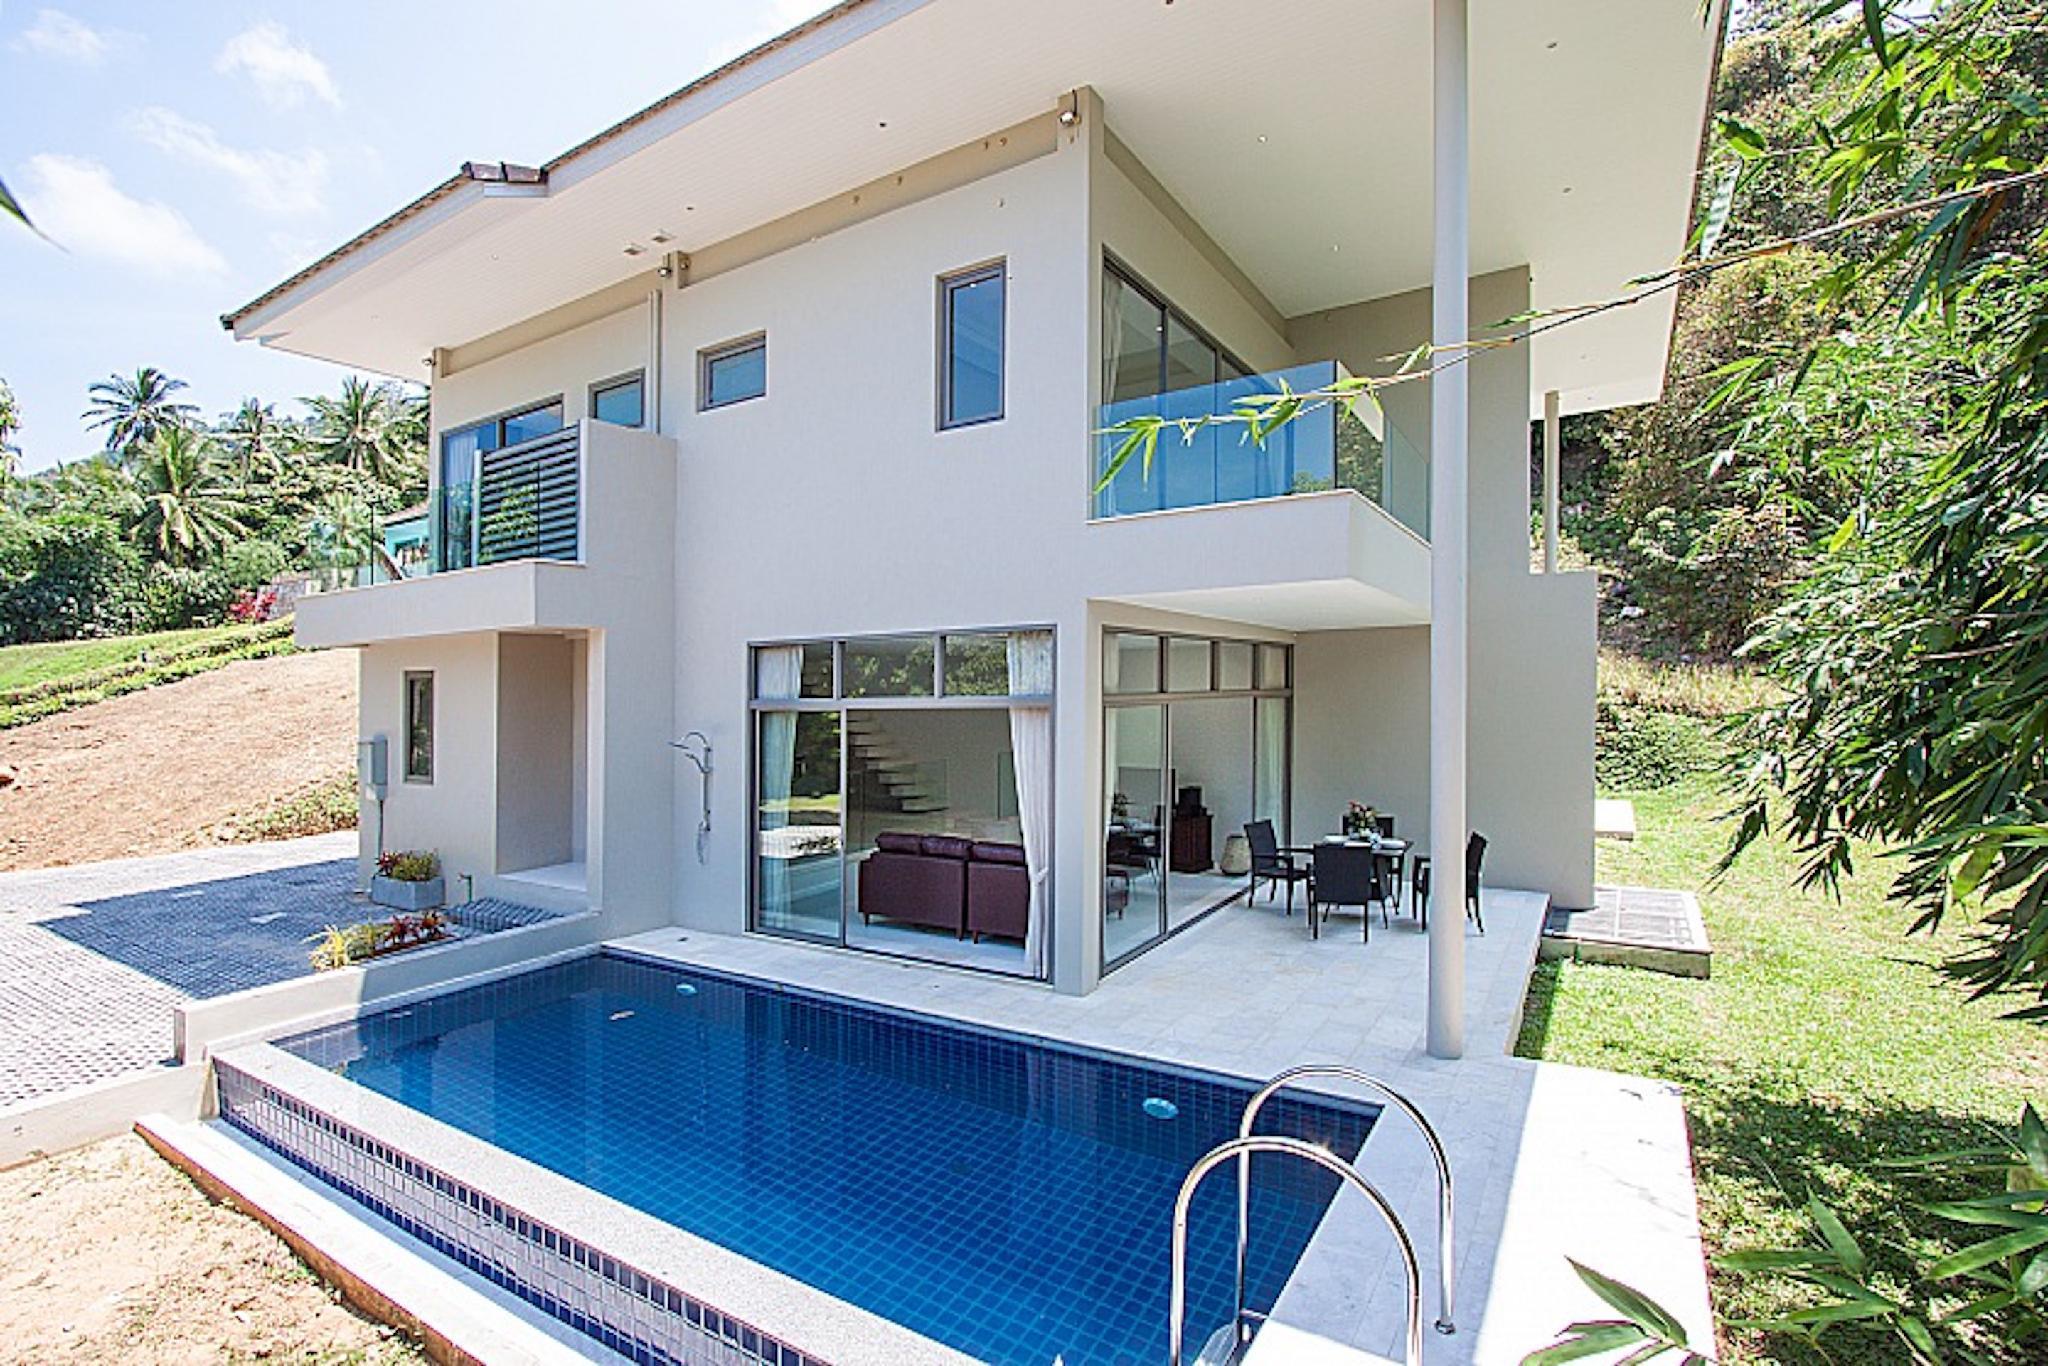 4 Bedroom Villa with 2 Private Pools 4 ห้องนอน 4 ห้องน้ำส่วนตัว ขนาด 700 ตร.ม. – บางปอ